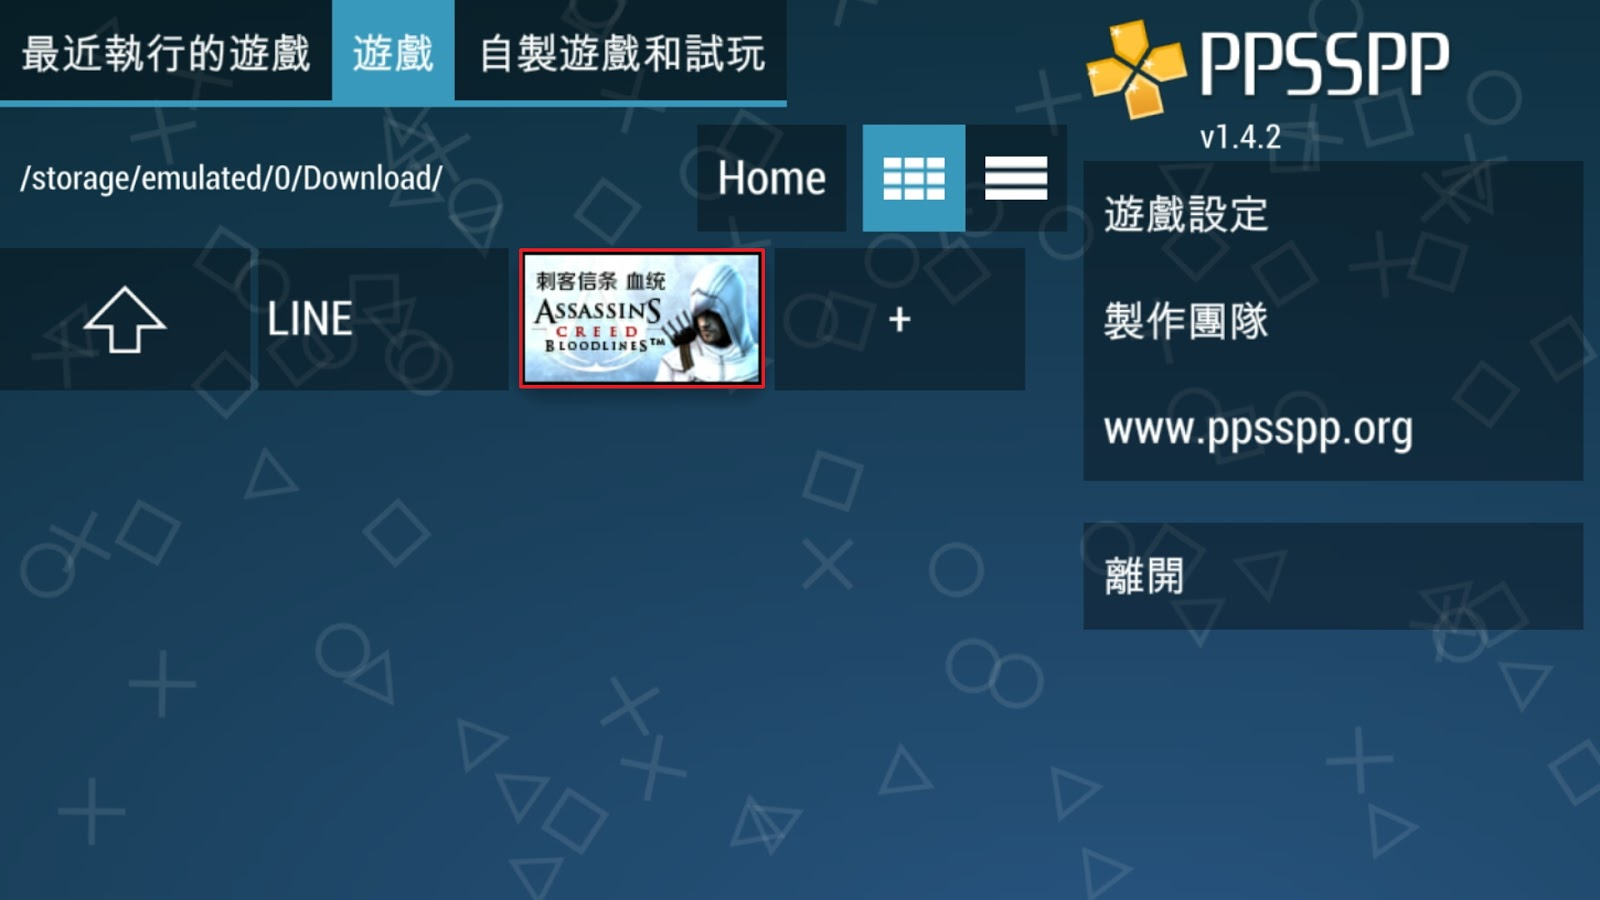 Screenshot 20170624 102951 - 《手機PSP模擬器》PPSSPP Gold v1.4.2.0 在手機上也能玩PSP遊戲!